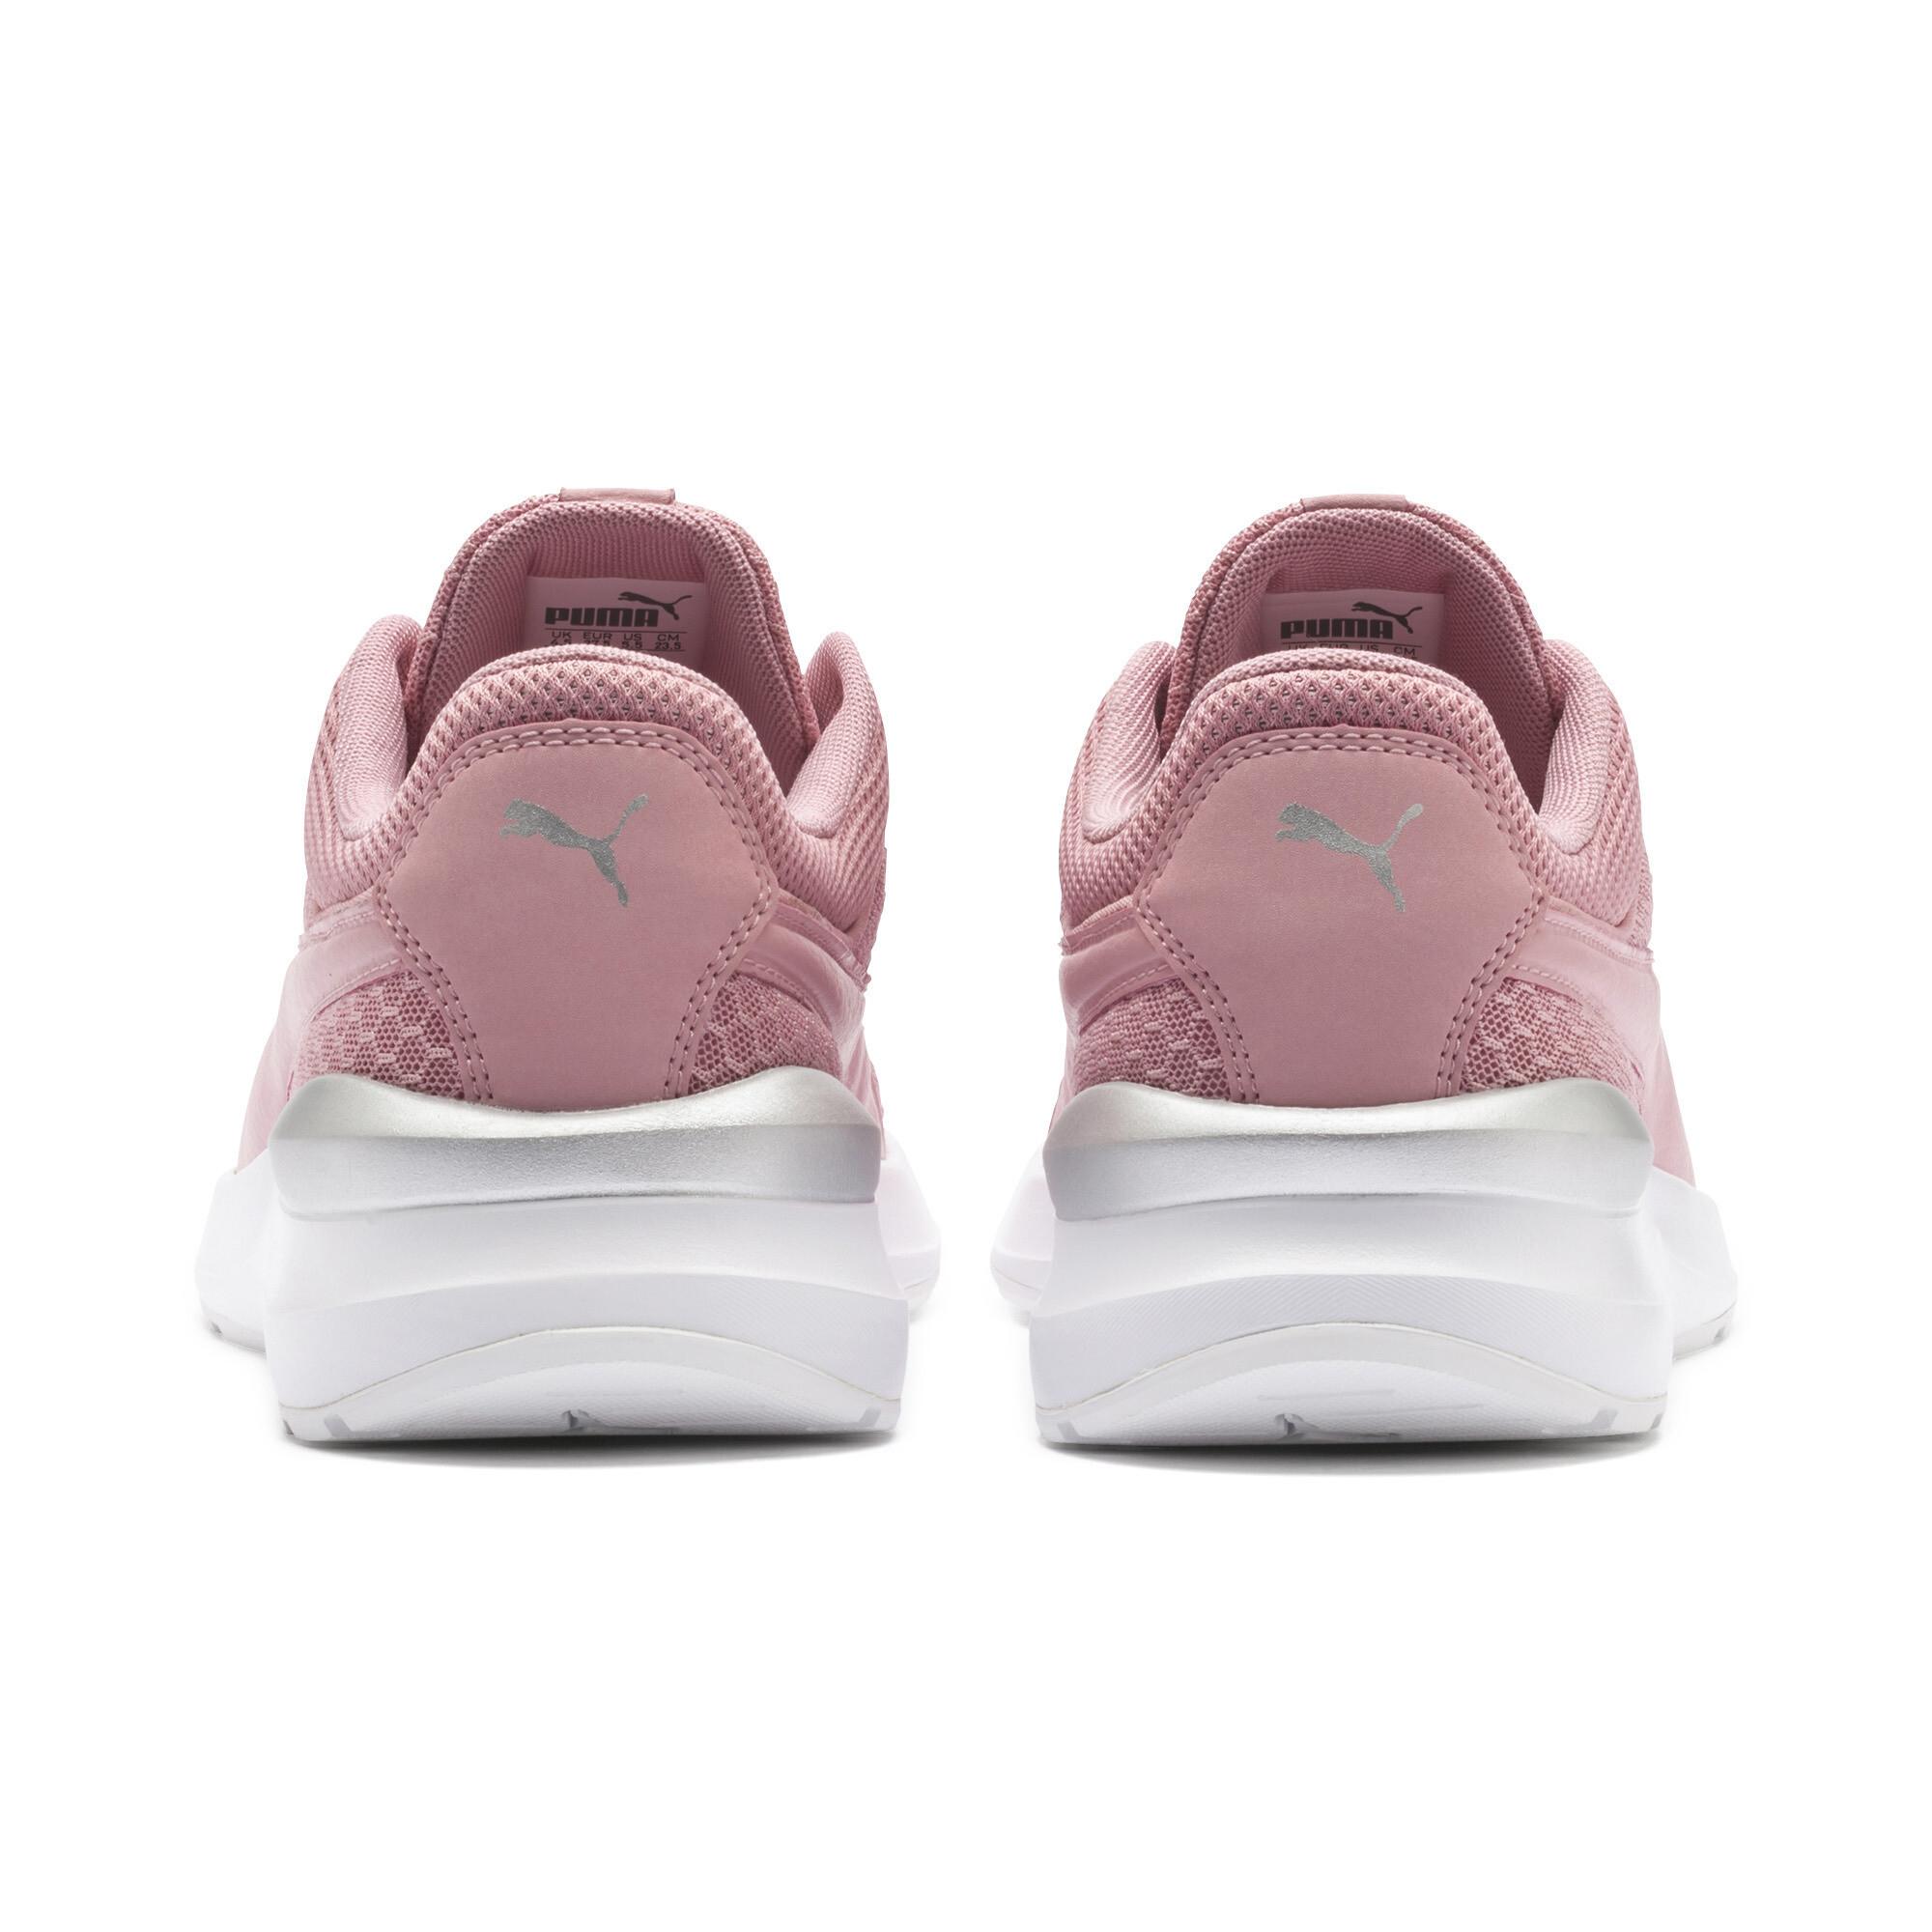 PUMA-Adela-Core-Women-s-Sneakers-Women-Shoe-Basics thumbnail 17